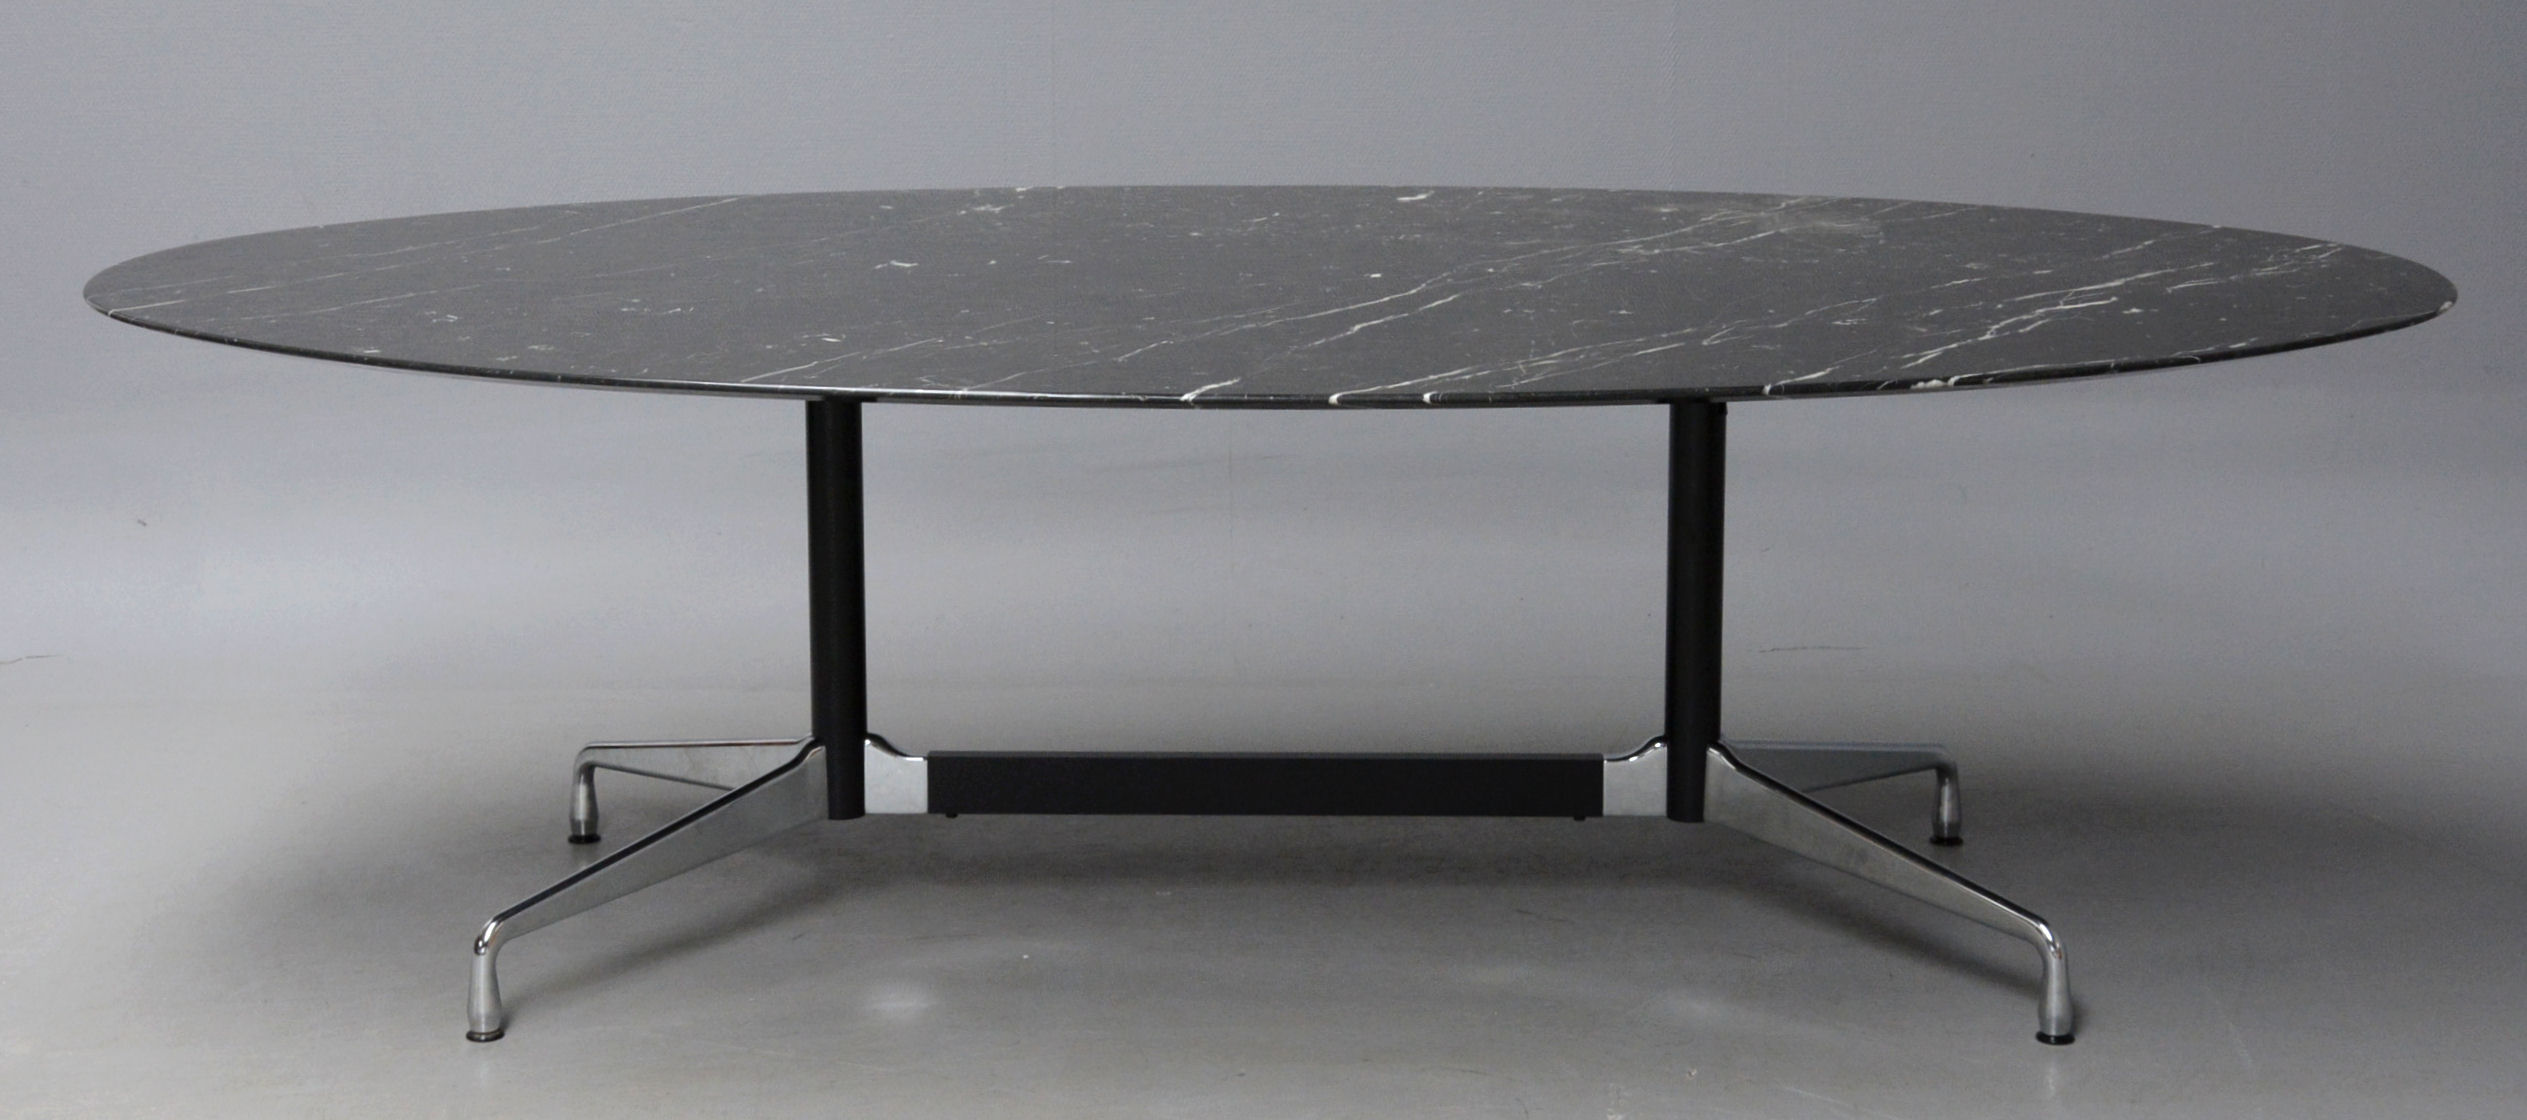 Auktionstipset - Charles Eames. Bord, model Segmented Table i ...